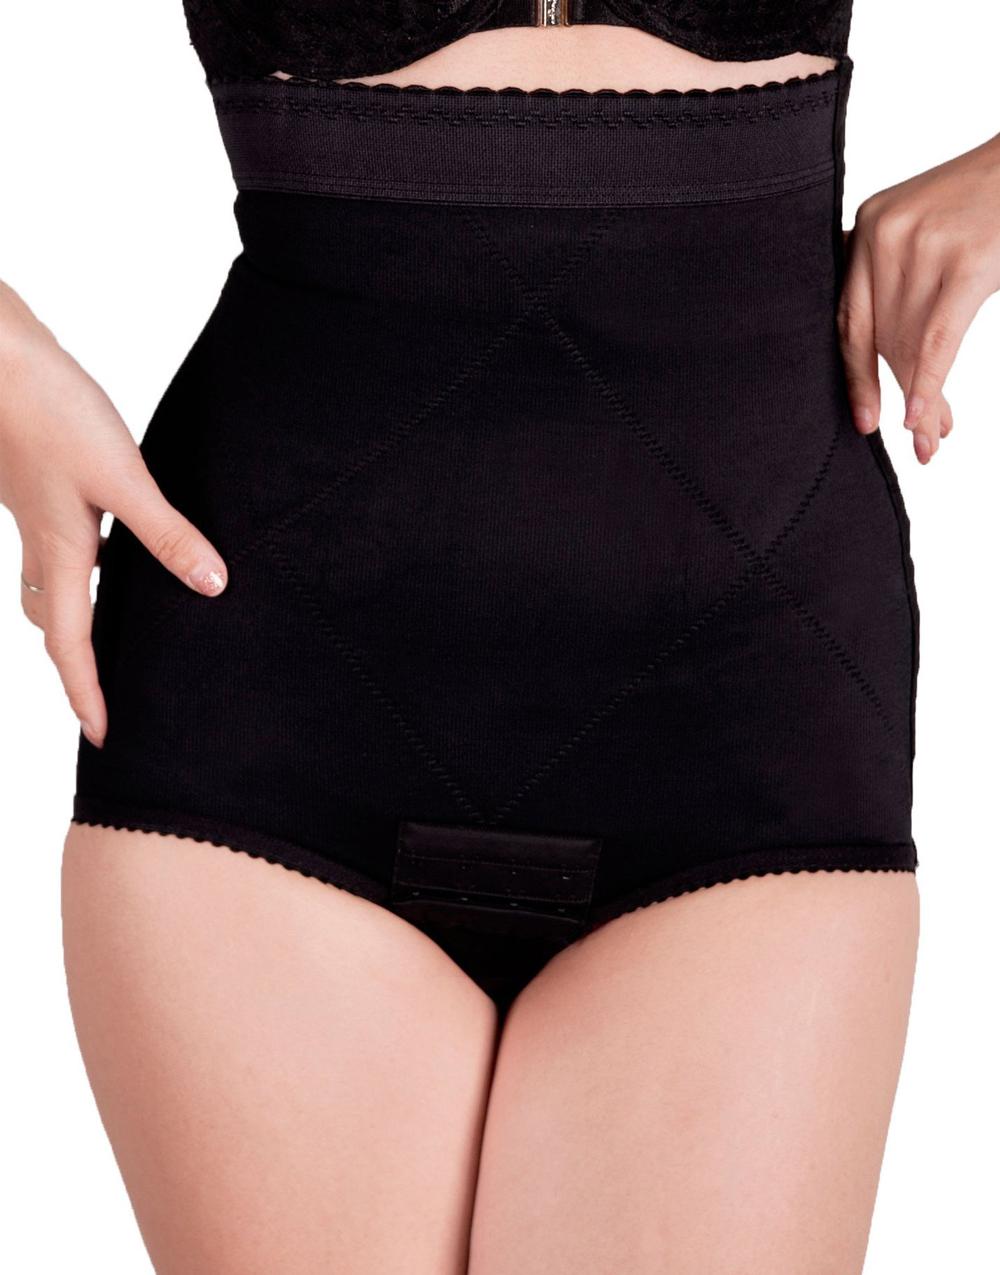 Postpartum Ultra Bikini in Black by Wink Shapewear | SMALL